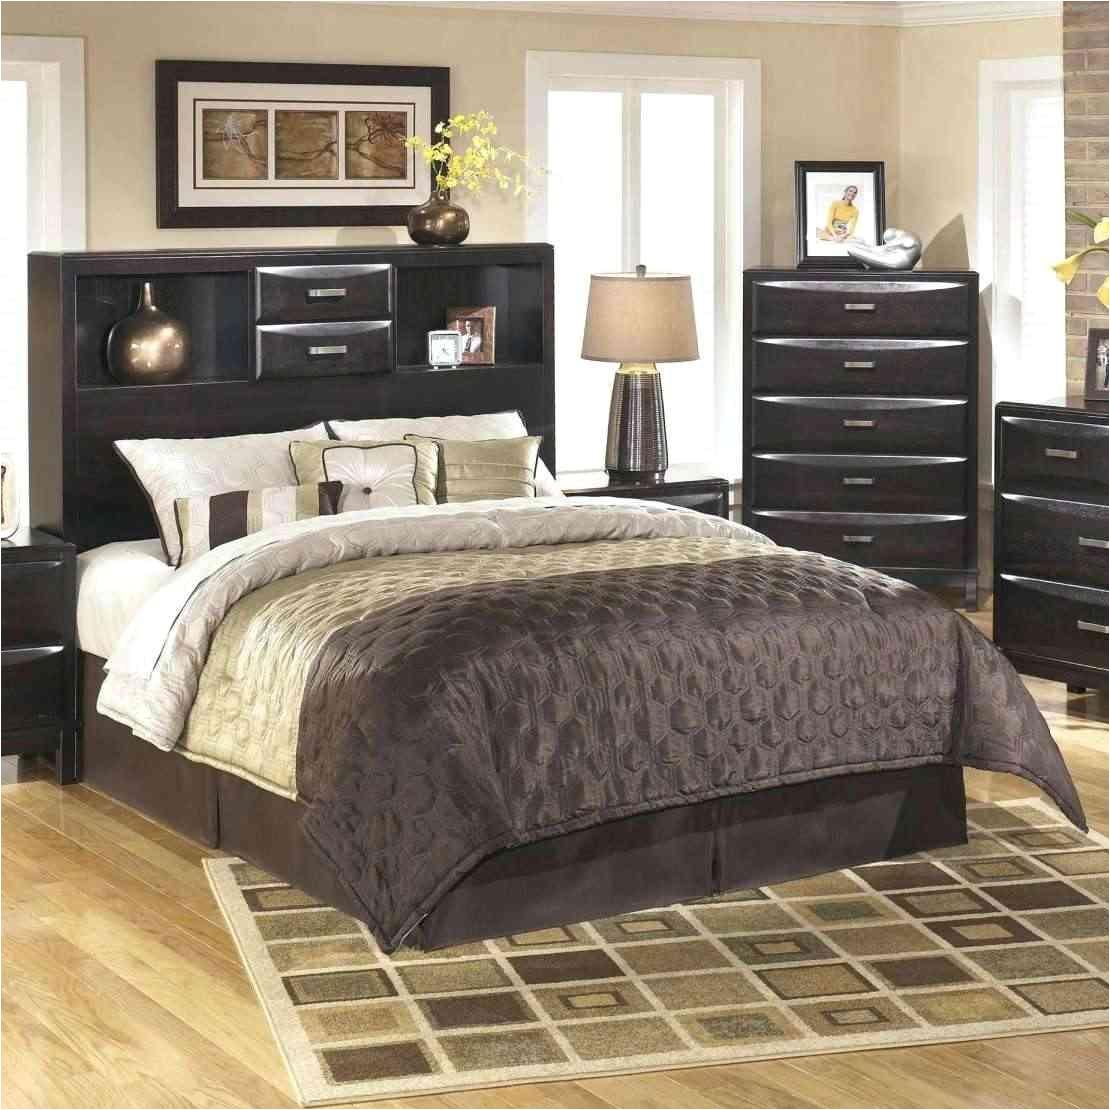 cal king bed frame with storage inspirational bookcases king storage headboard ashley furniture kira cal black